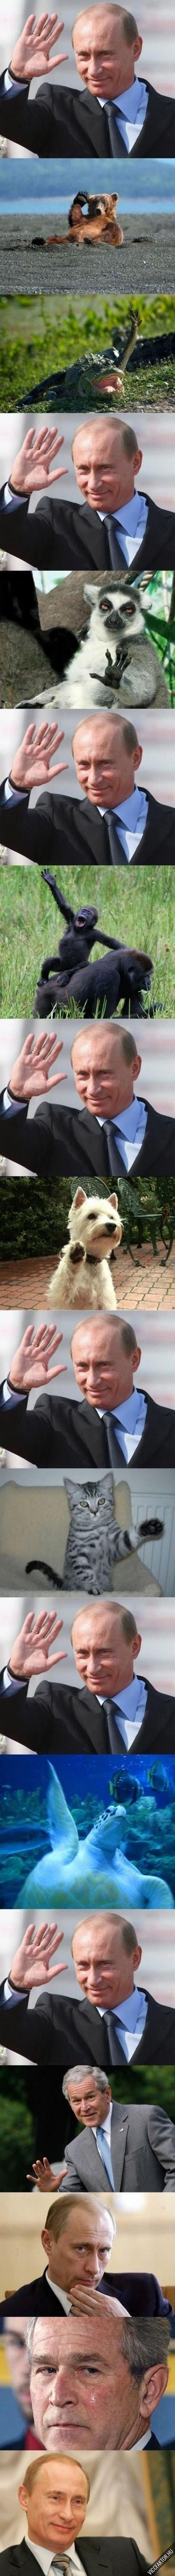 Csőőő Putyin! #2